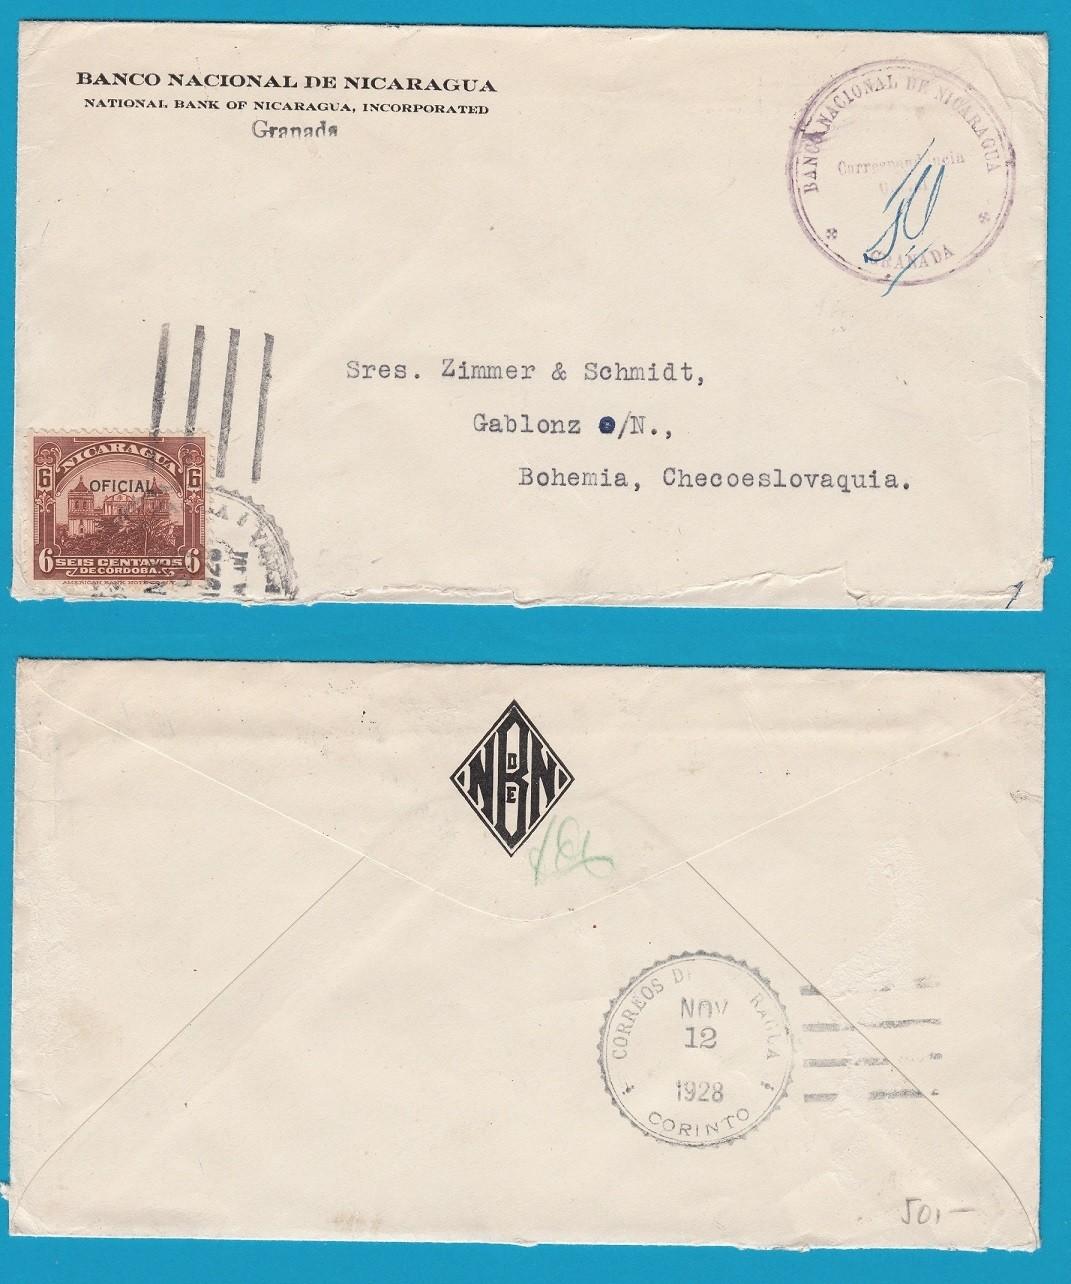 NICARAGUA official cover 1928 Granada to Chechoslovakia